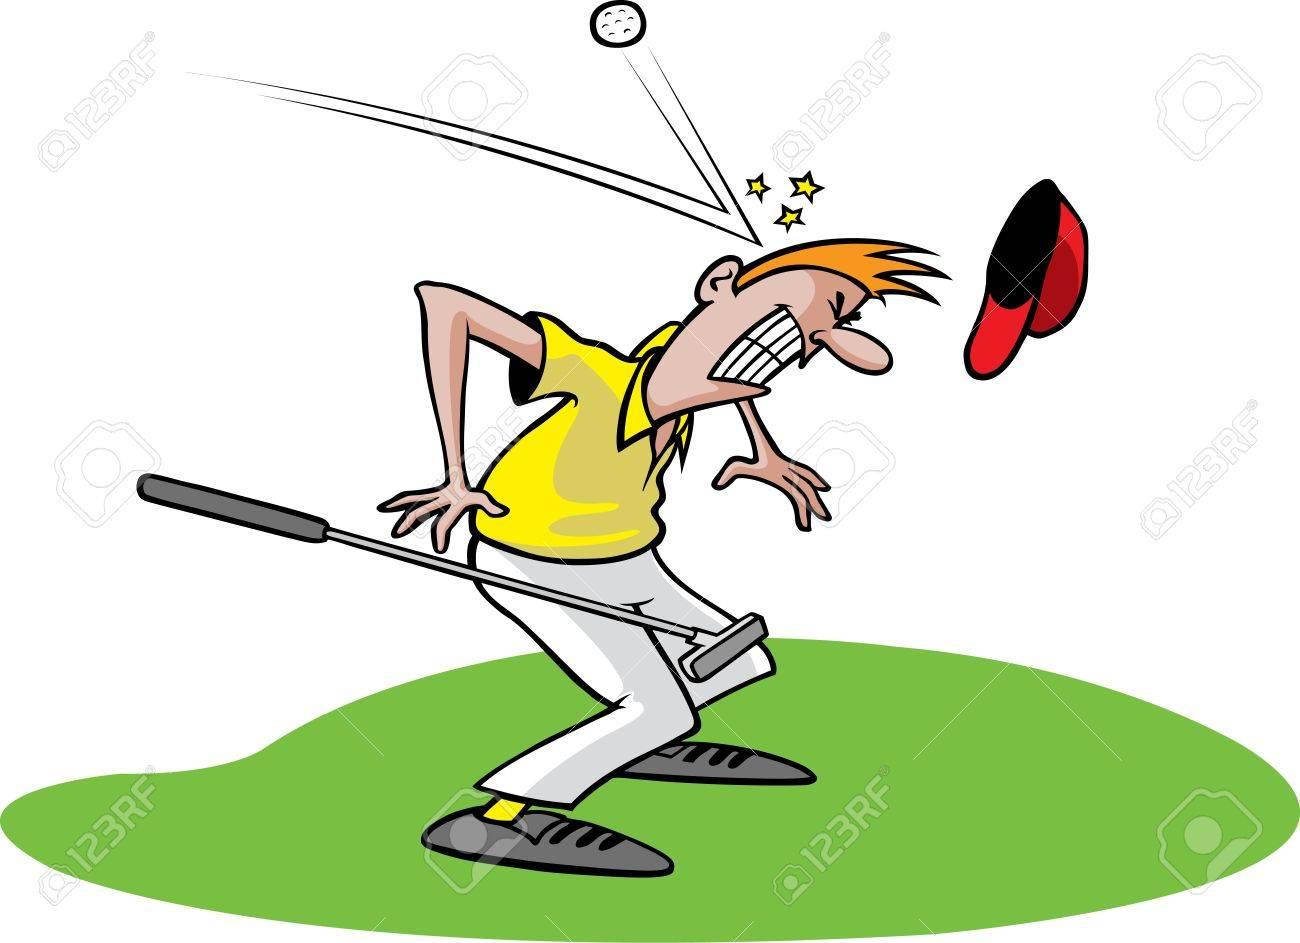 Cartoon of an unlucky golfer Layered and high resolution jpeg files available - 16513720